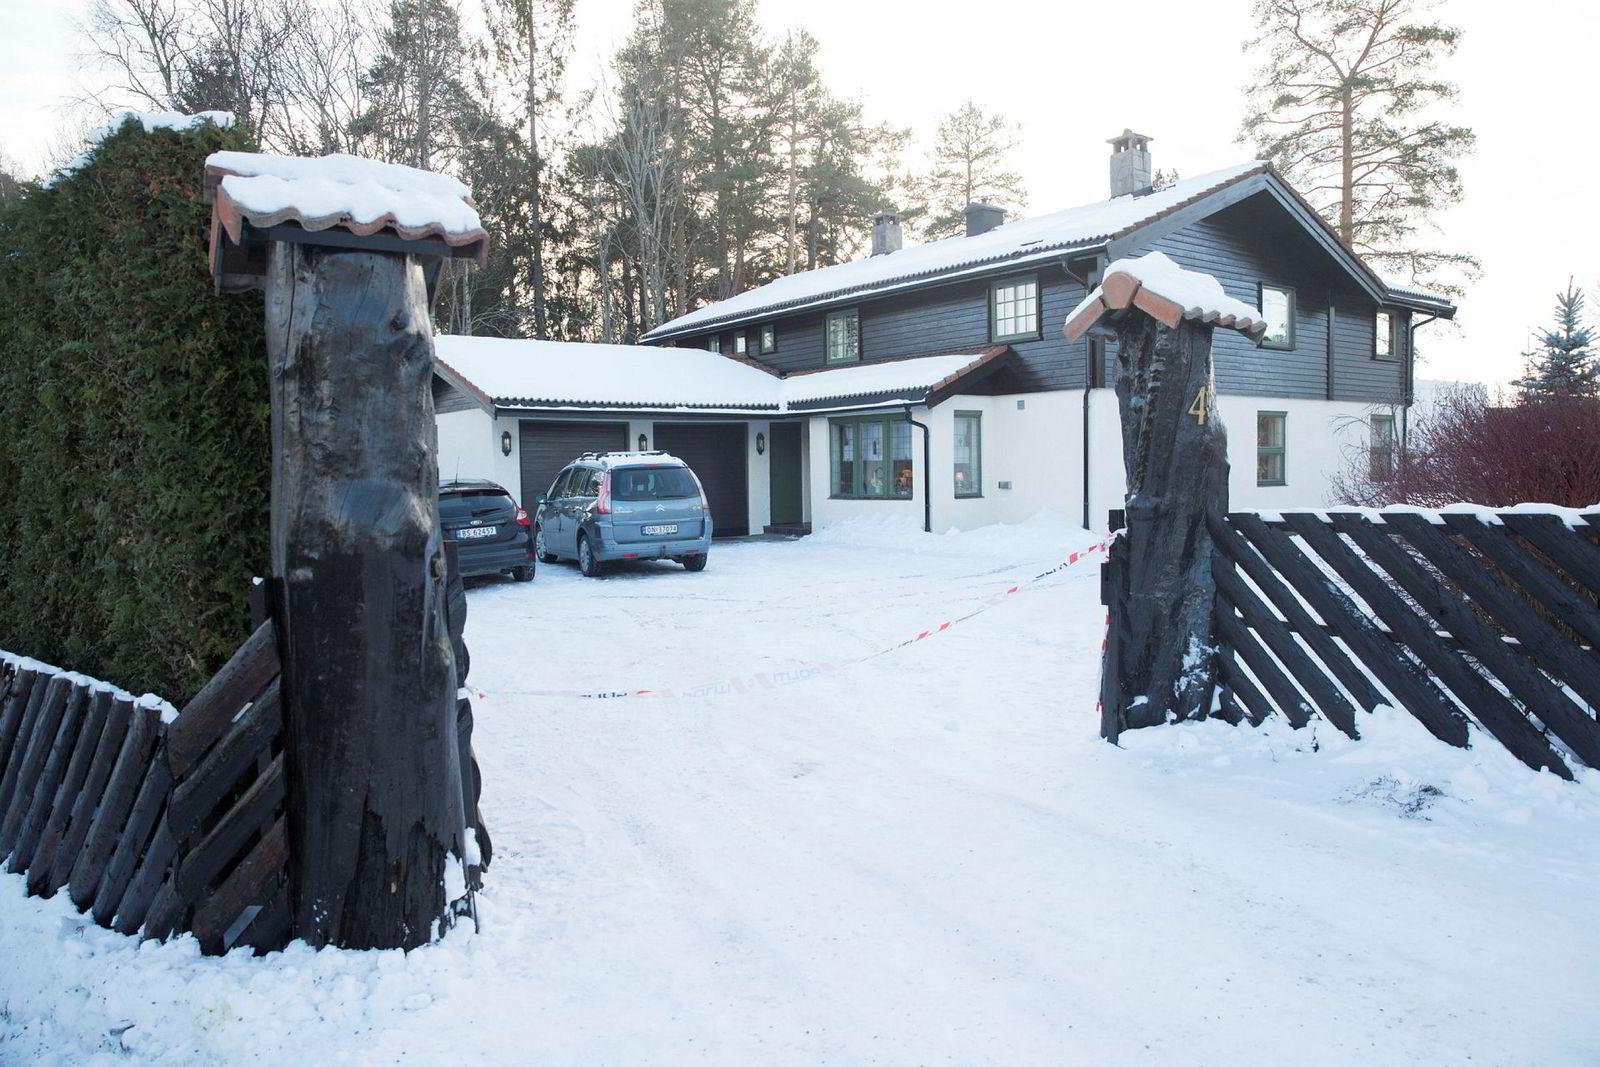 Anne-Elisabeth Hagen ble sist observert her ved hjemmet på Fjellhamar tidlig på dagen den 31. oktober.